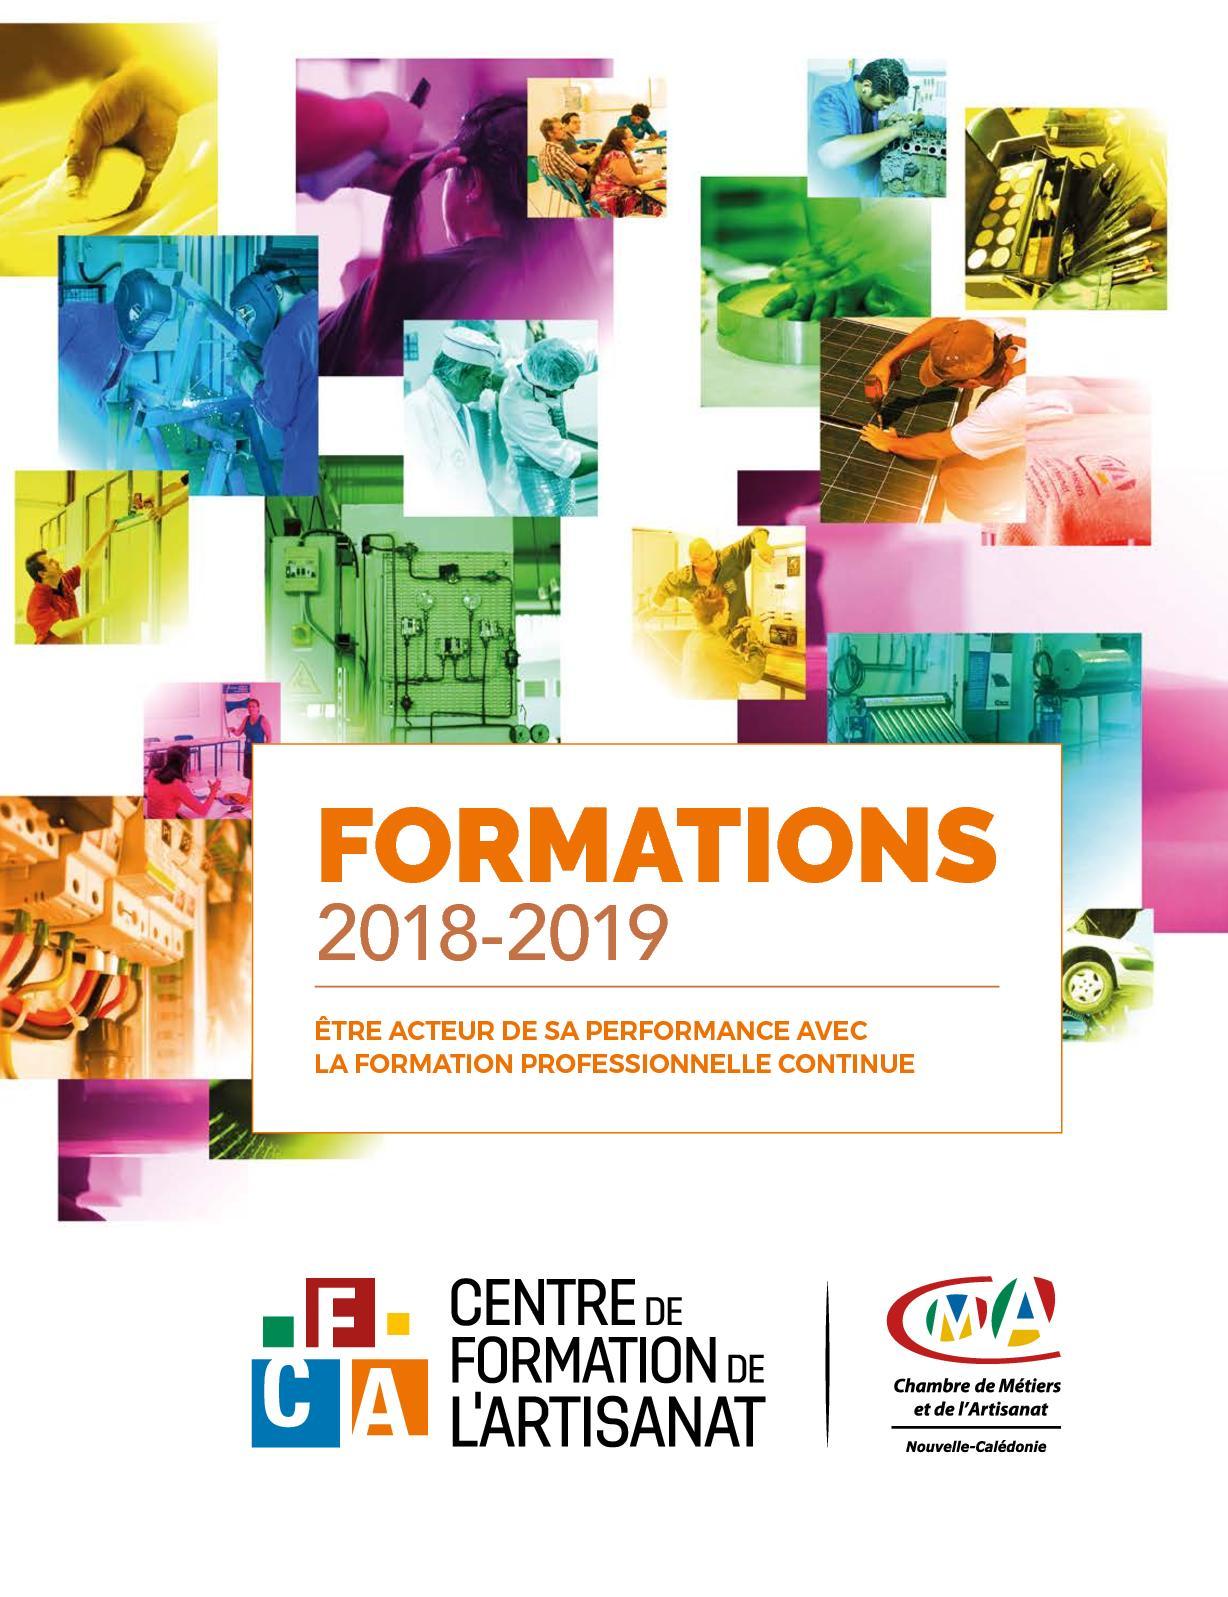 Calaméo - Catalogue Formation Cfa Cma Nc 2018 2019